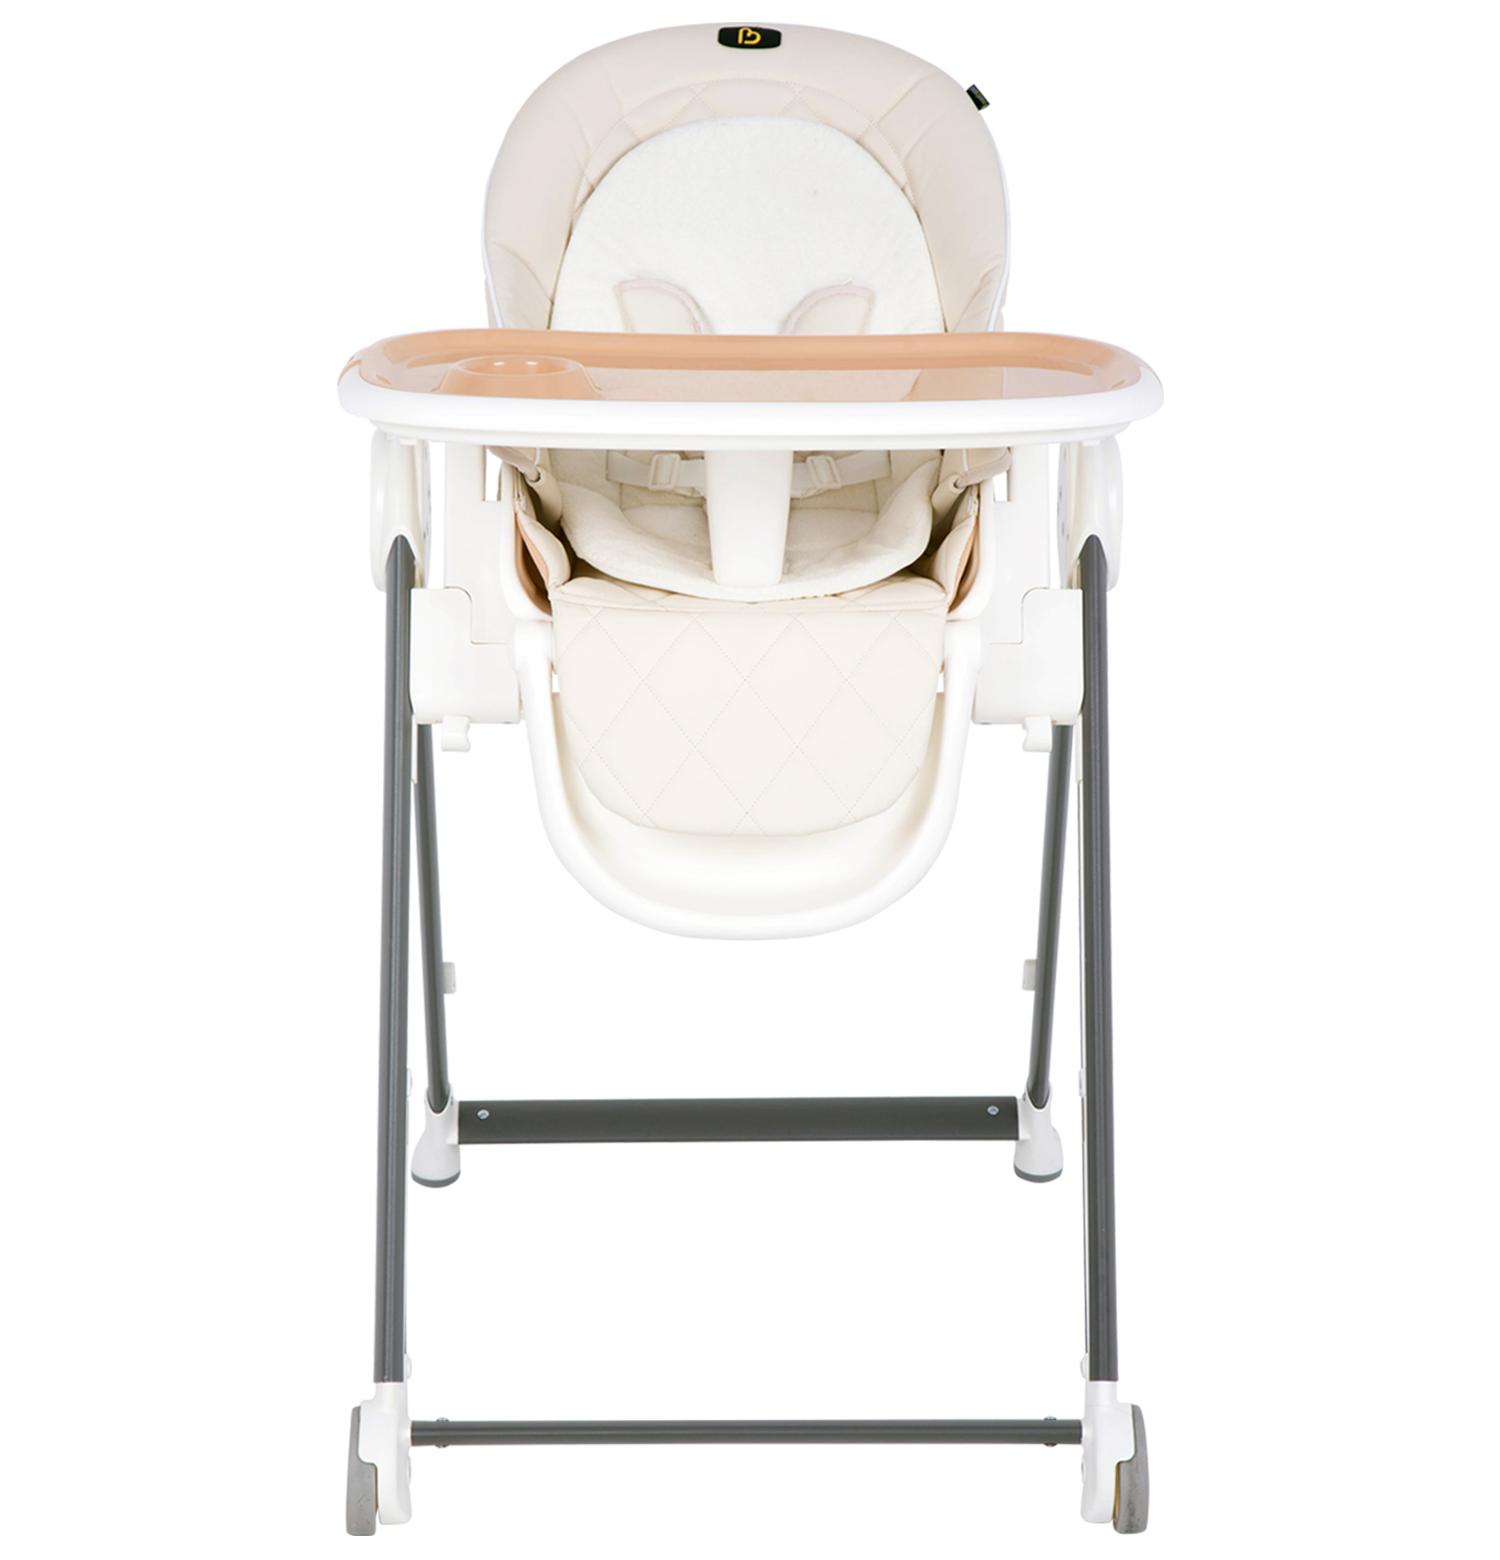 Bonbijou Elegance Adjustable Height High Chair